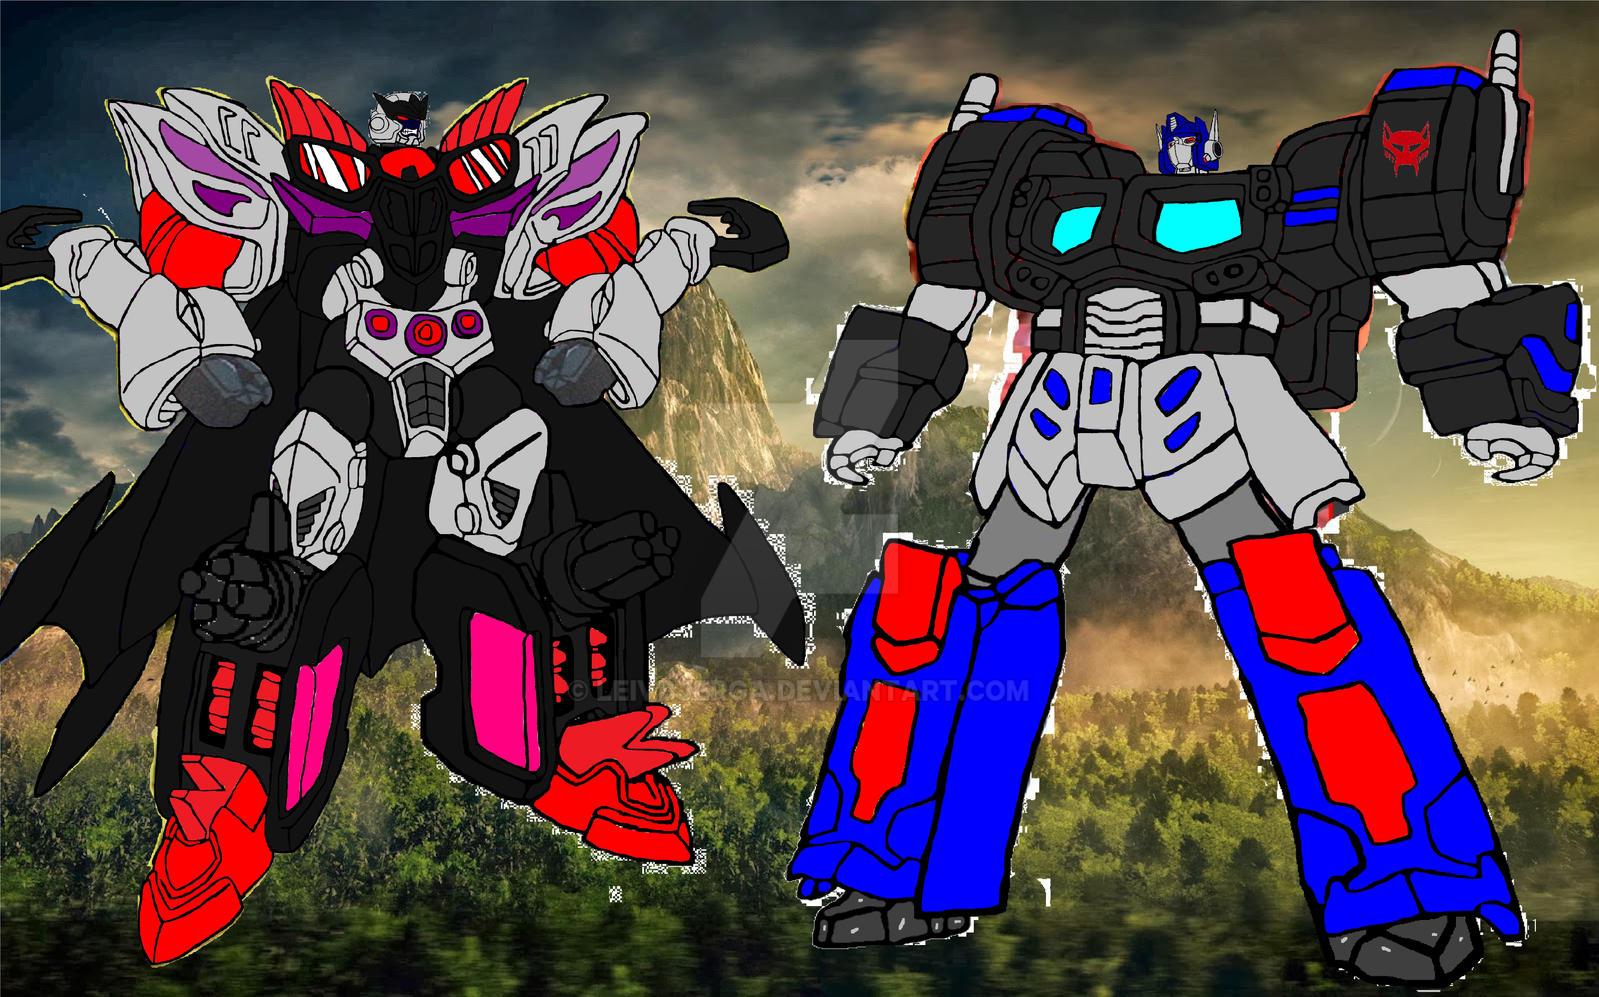 tf beast wars future optimus primal vs megatron by